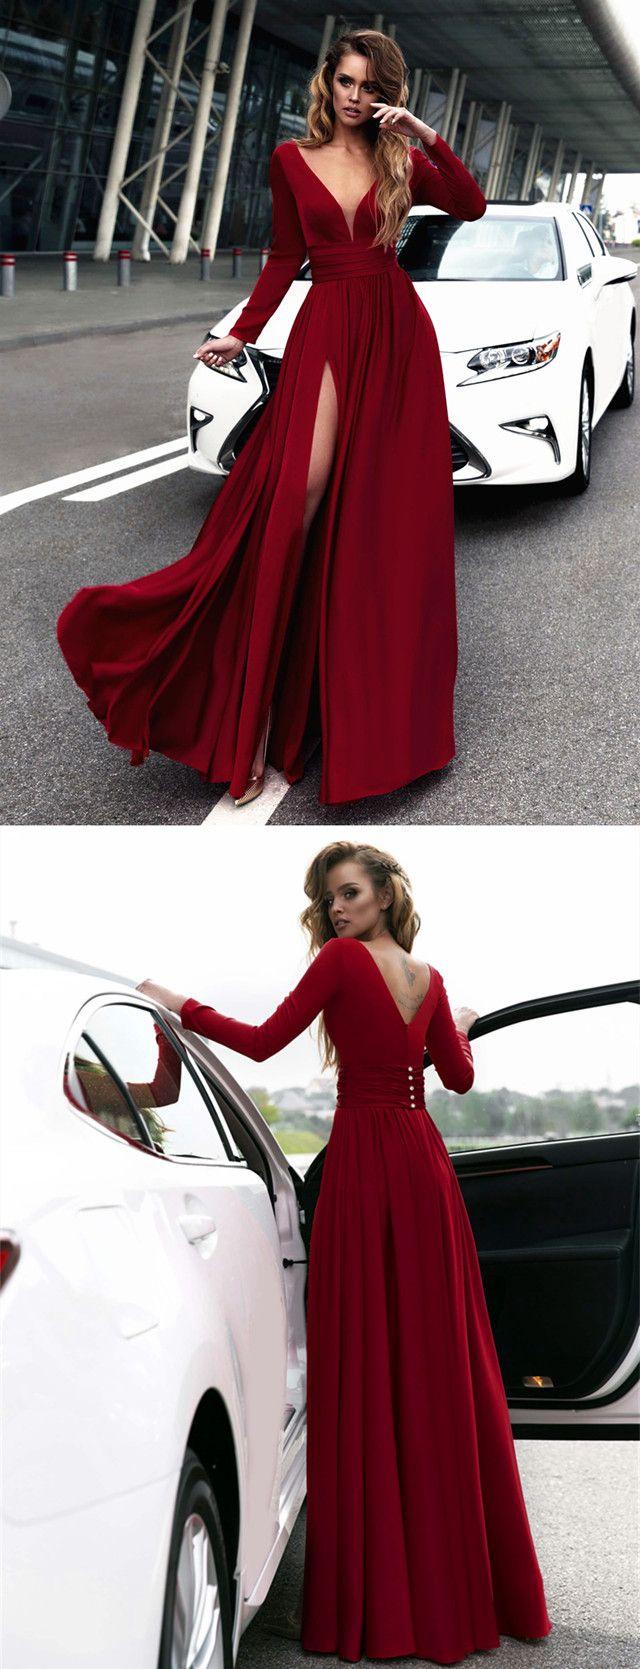 7c564f3e54b Long Sleeves Evening Dresses Chiffon V-neck Split Prom Dress